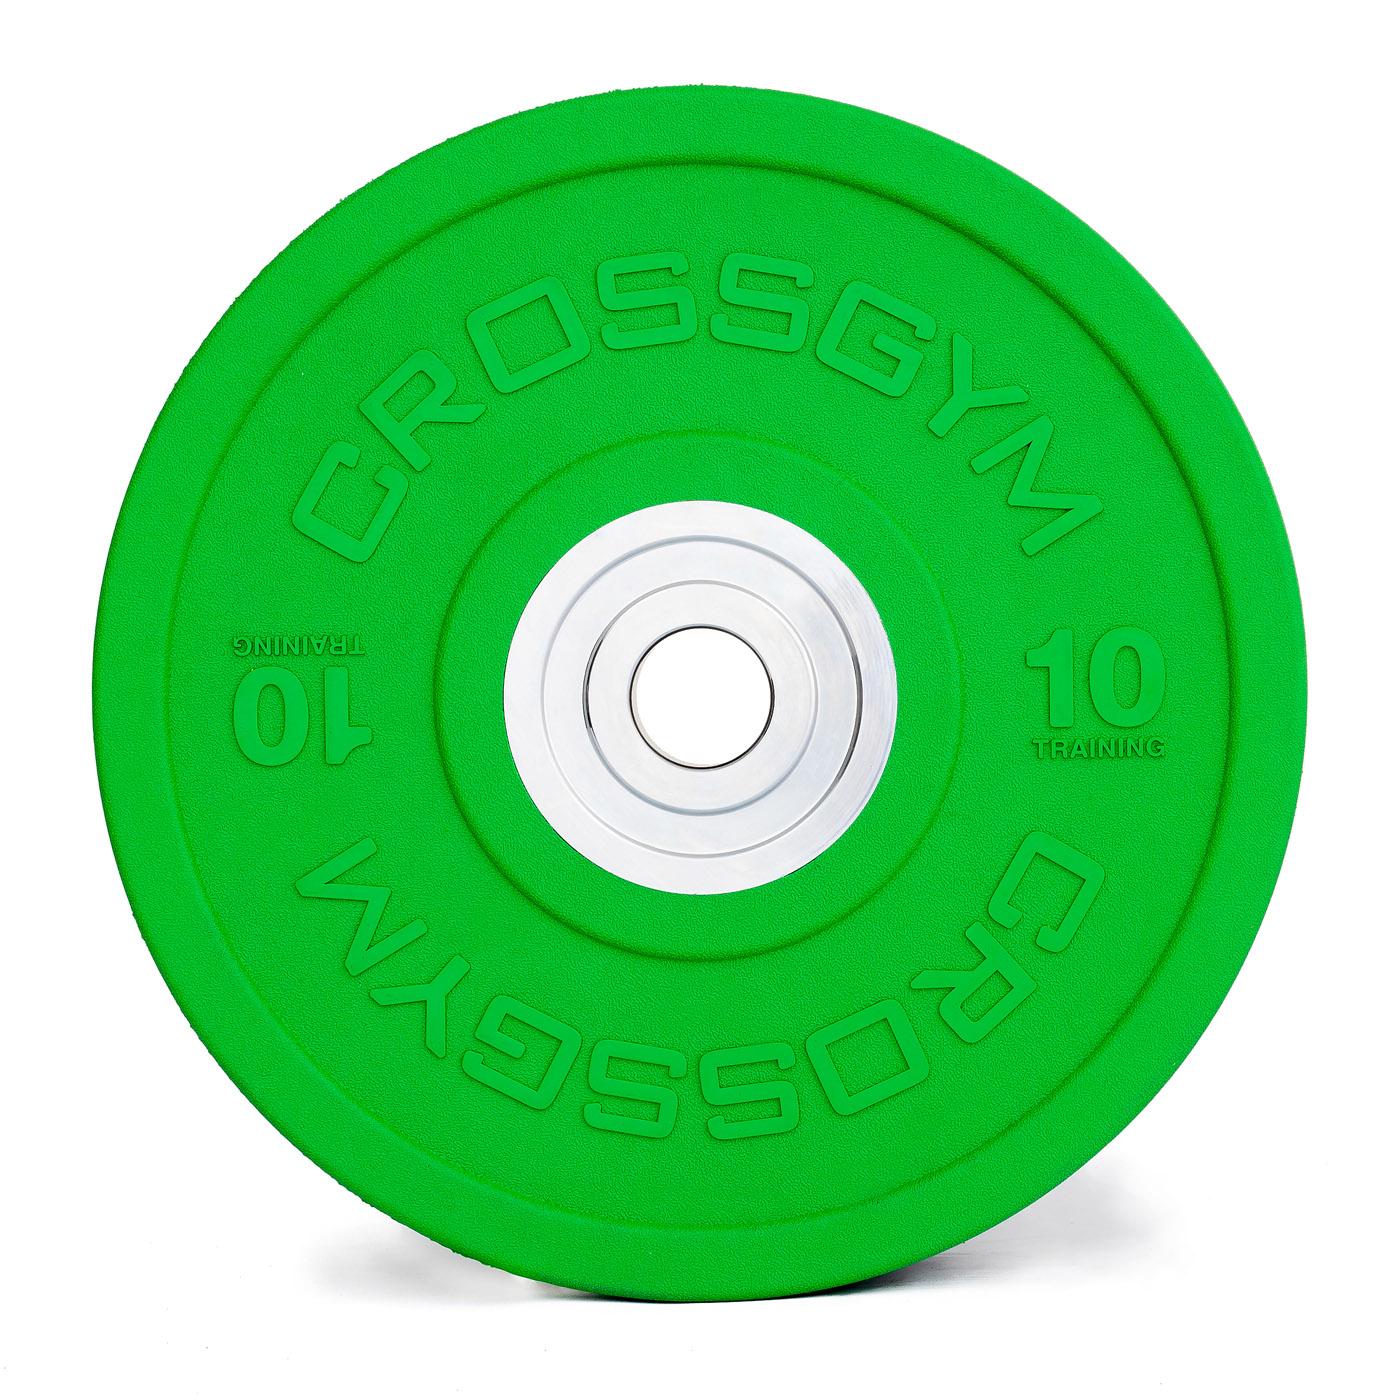 Kotouč Bumper Plate TRINFIT gumový 10 kg /50 mm CrossGym